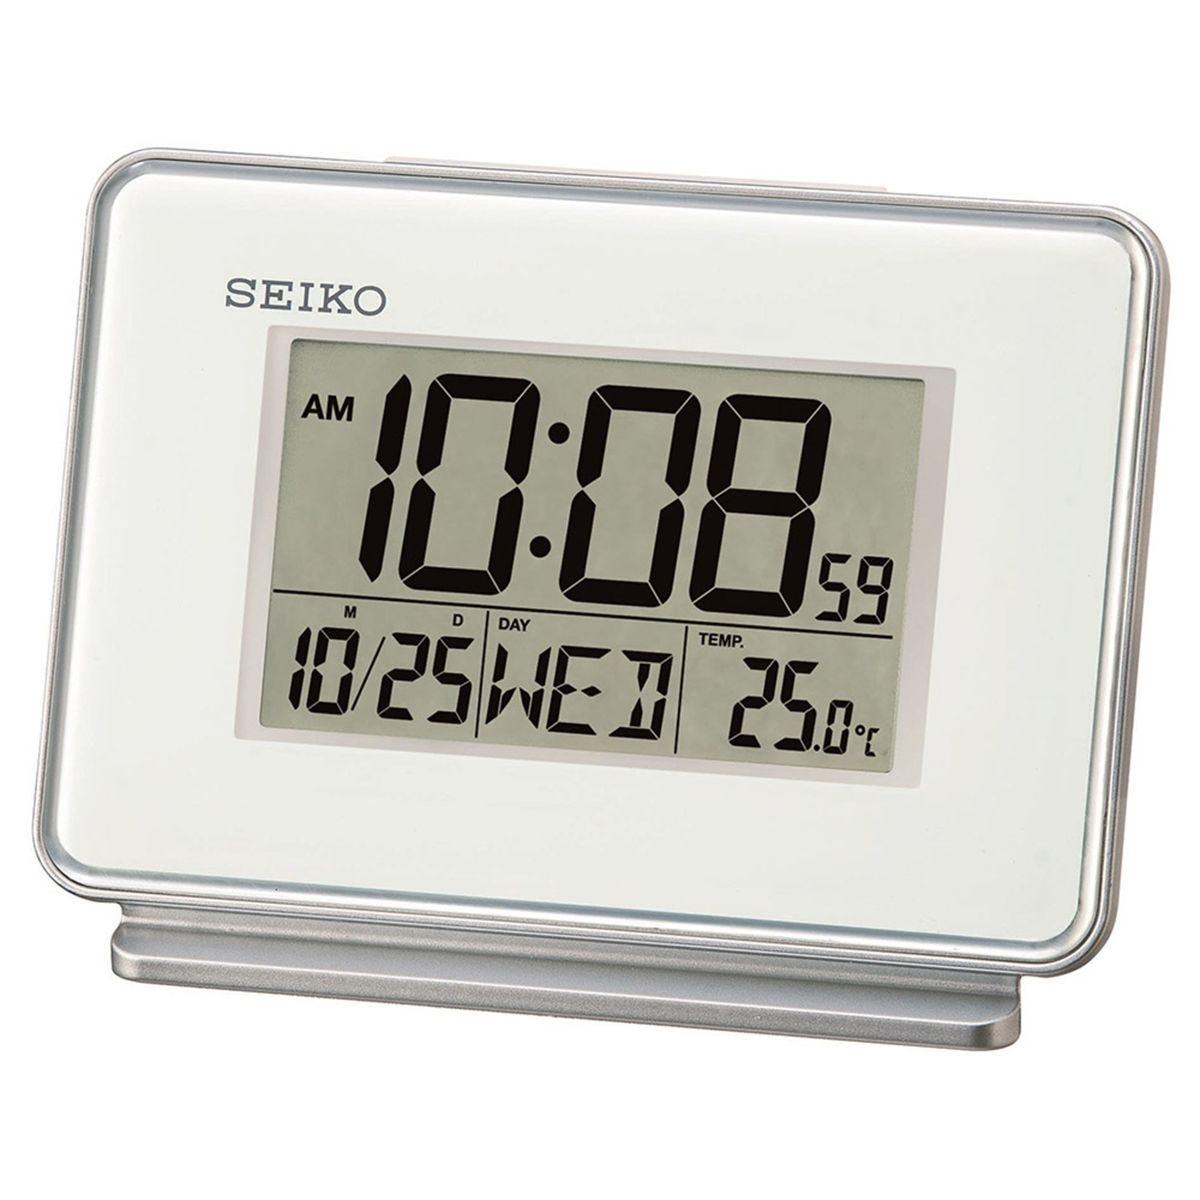 Seiko LCD Dual Alarm Calendar Clock - White